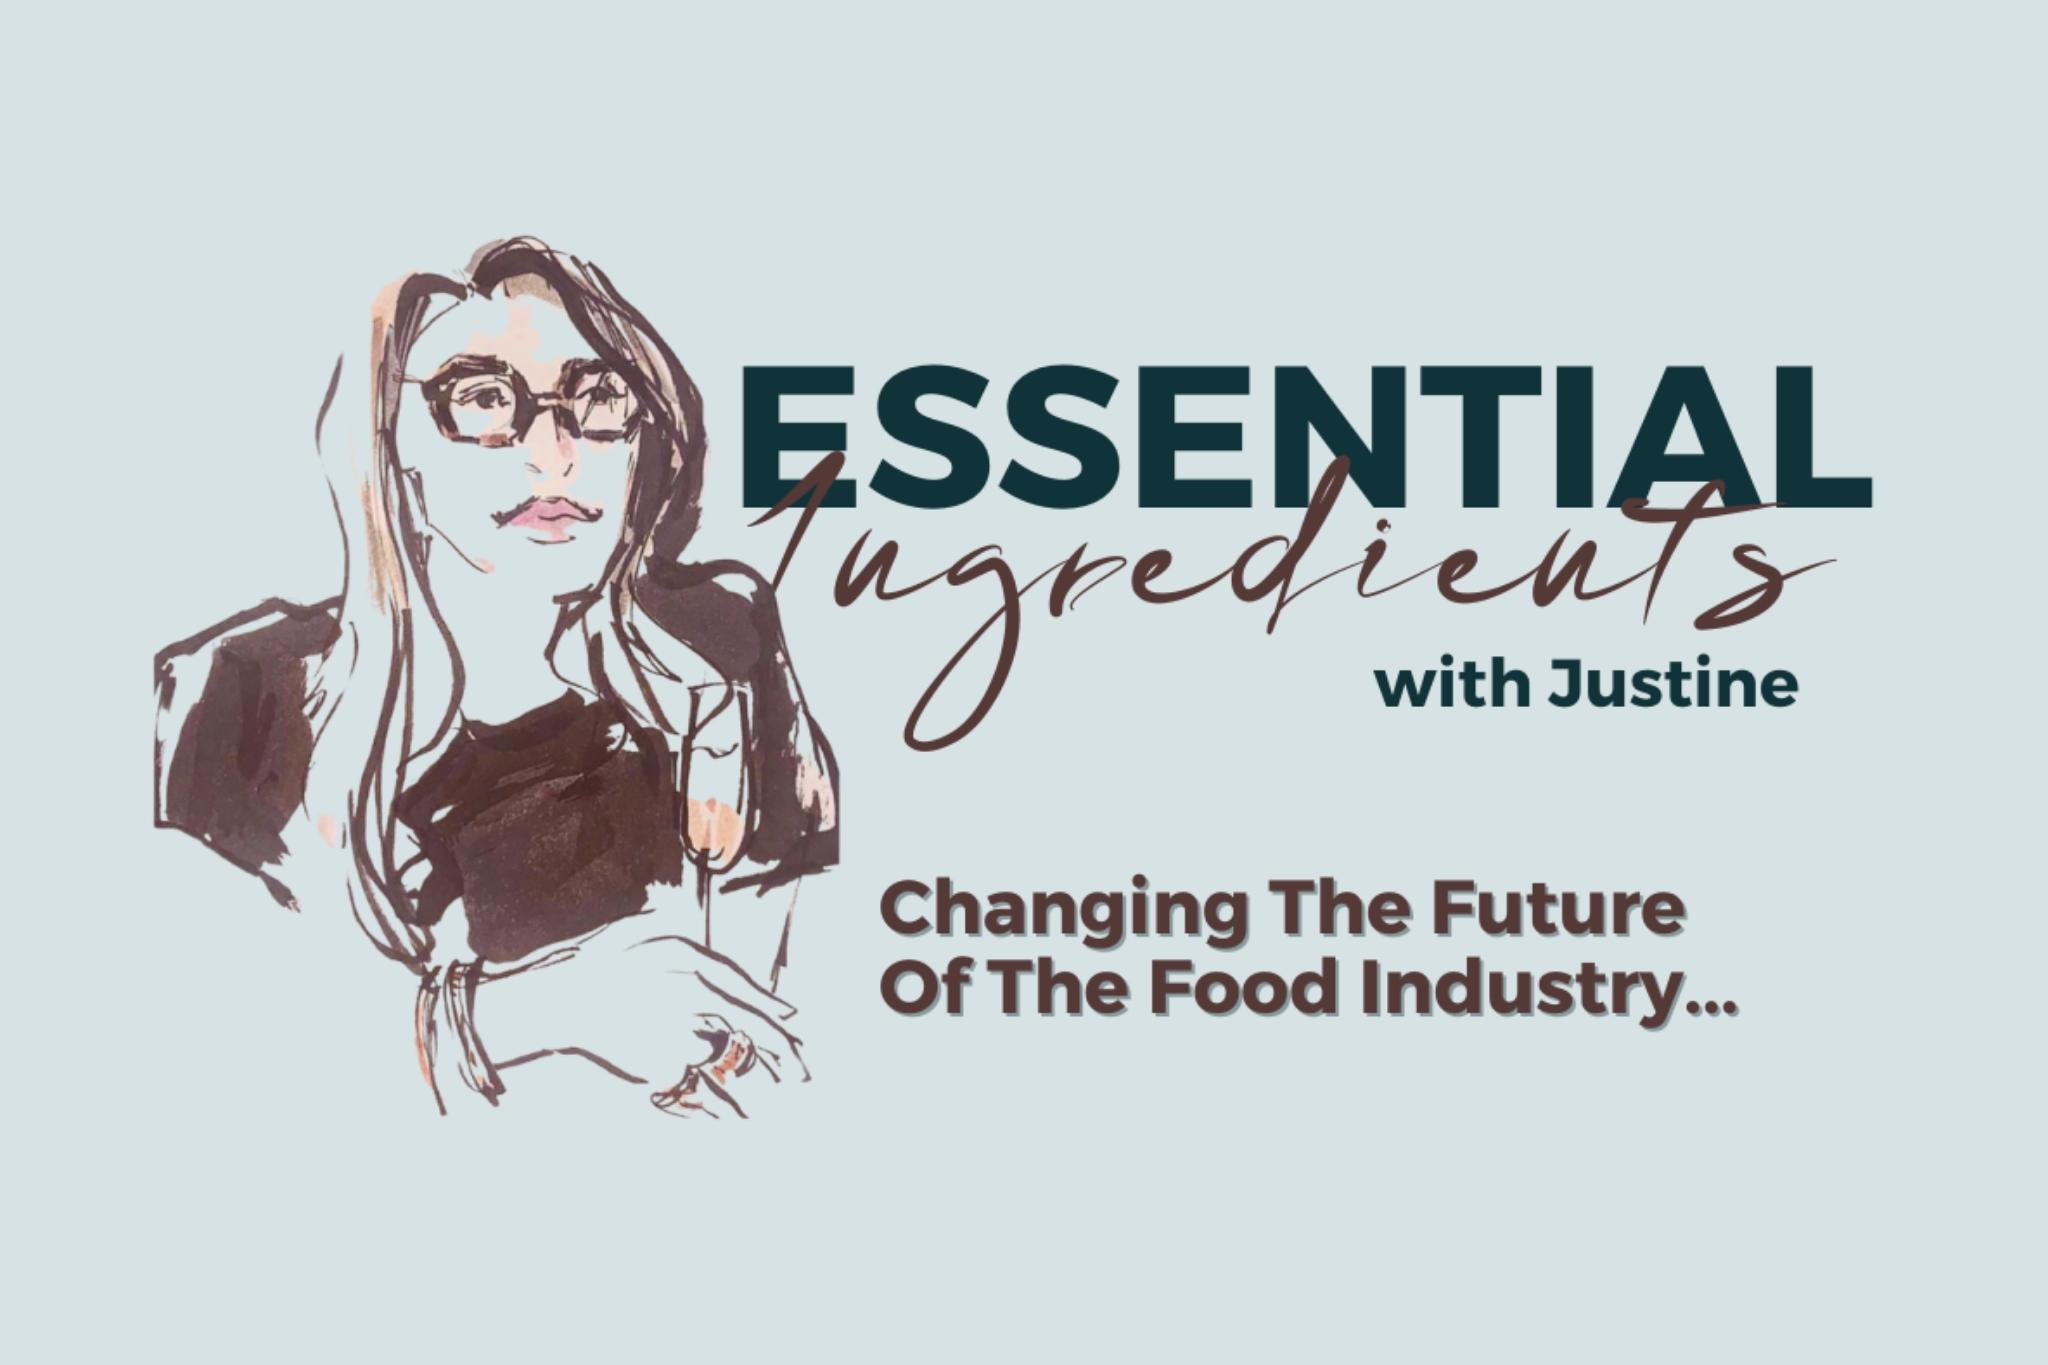 Essential Ingredients with Justine Reichman podcast powered by NextGenChef